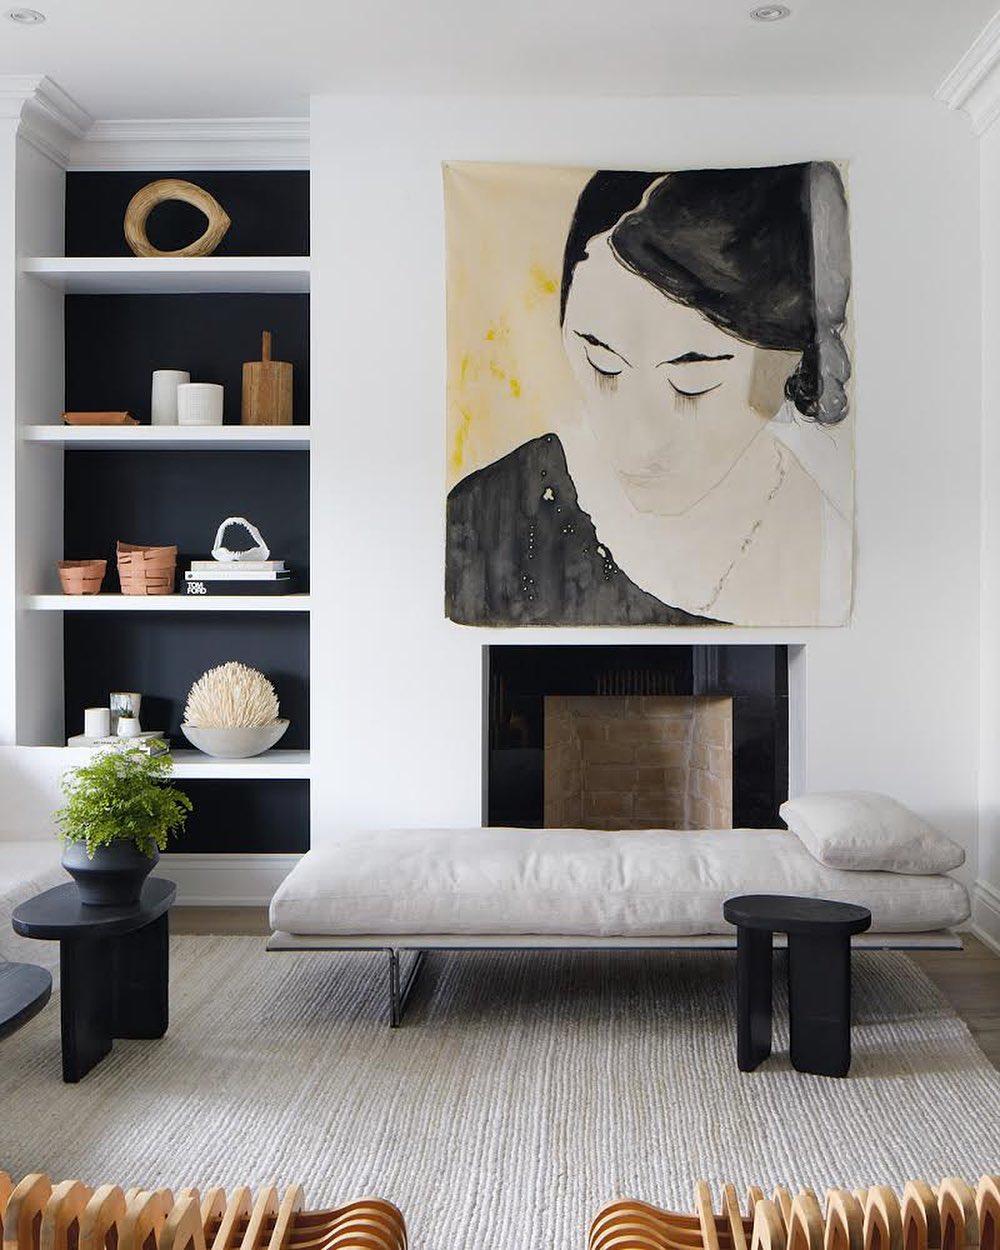 20 of Today's Brilliant 💡 Design Inspo for Women Who Love 💜 New Design Styles 🎀 ...